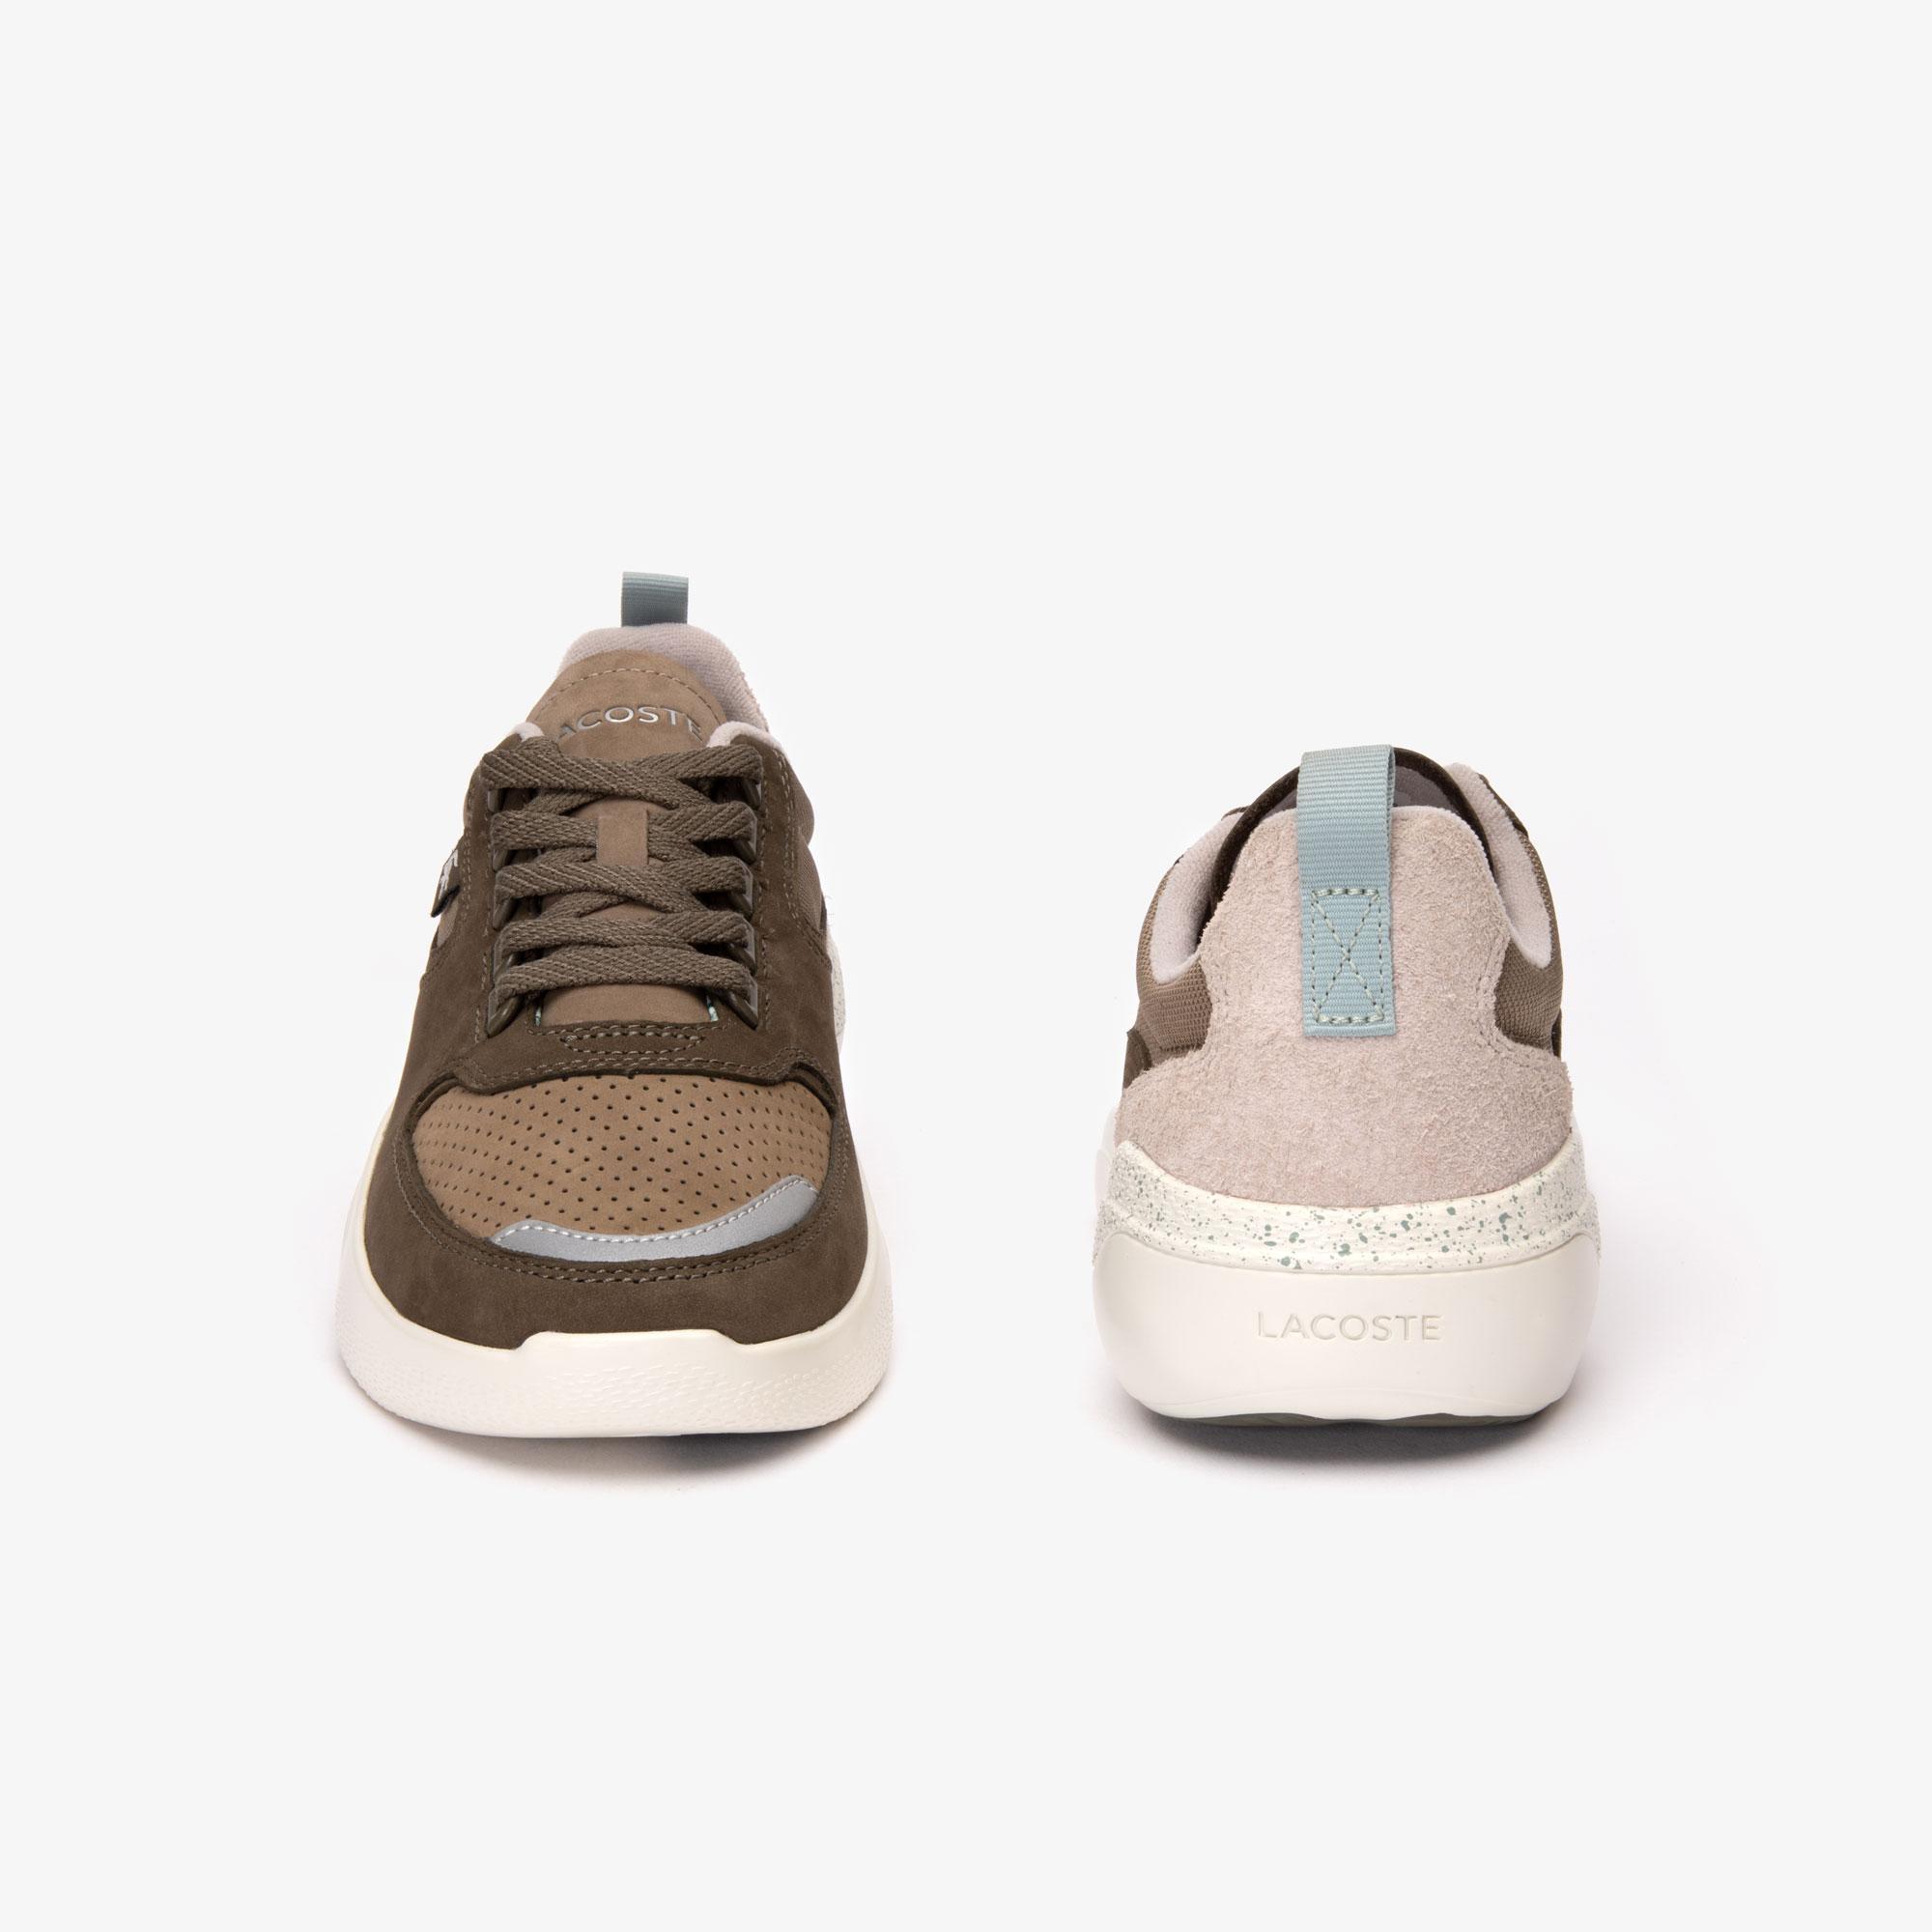 Lacoste Wildcard 419 1 Męskie Sneakersy